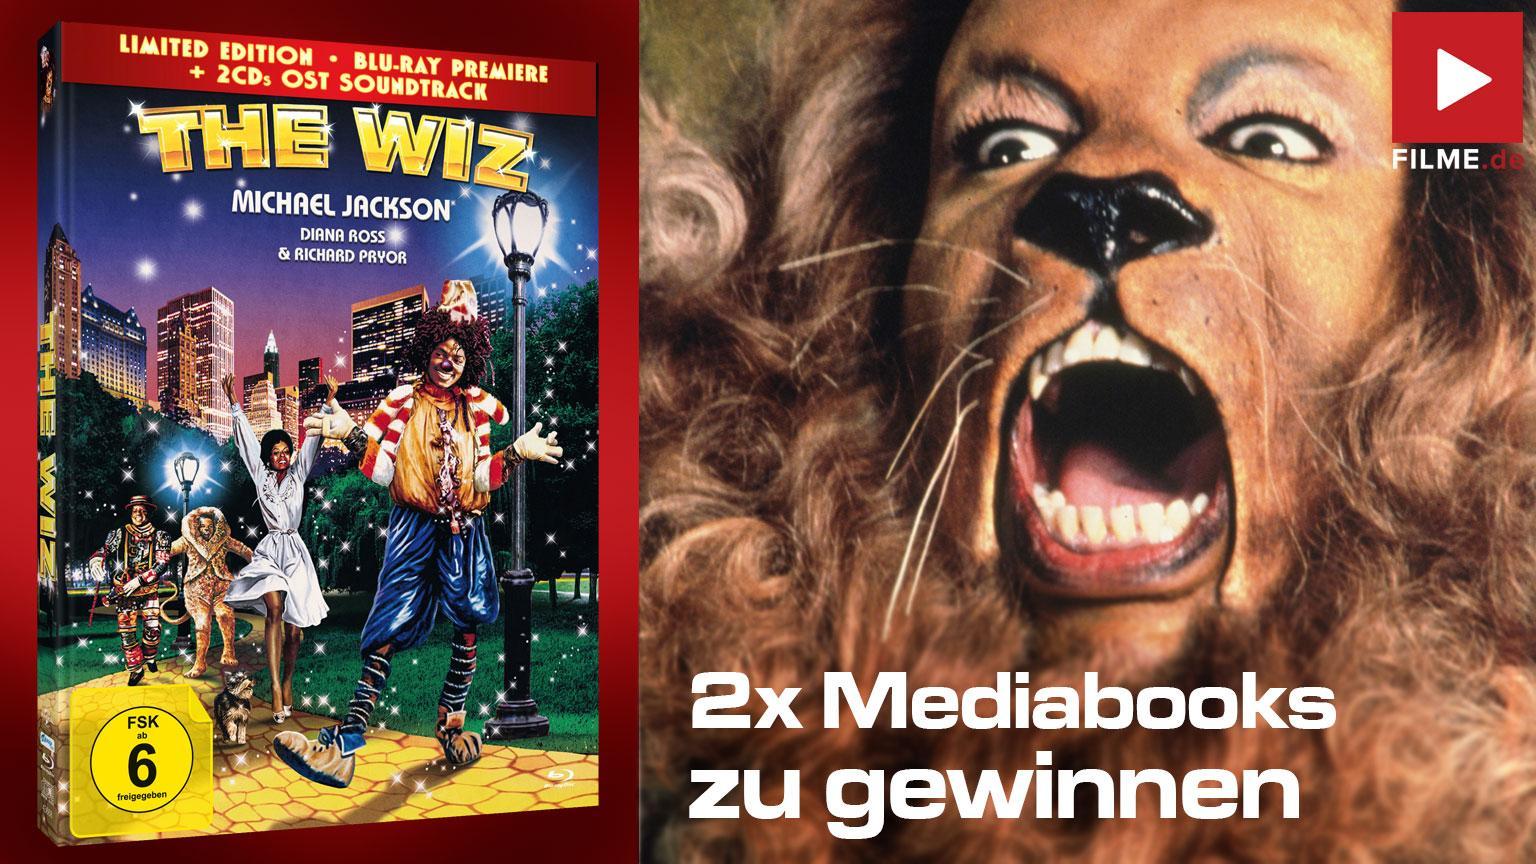 The Wiz Gewinnspiel Artikelbild Mediabook